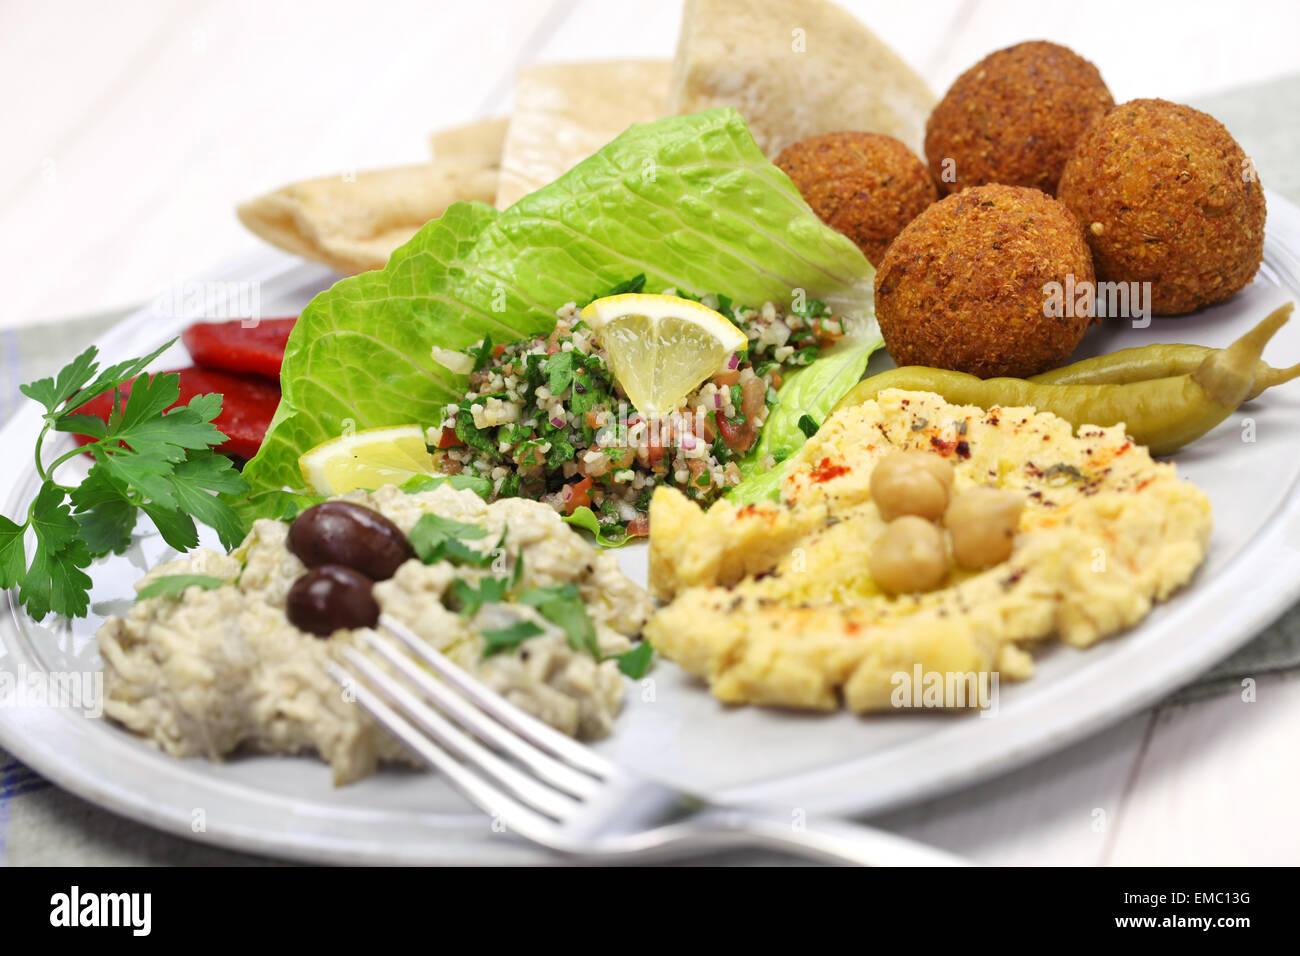 hummus, falafel, baba ghanoush, tabbouleh and pita, middle eastern cuisine - Stock Image